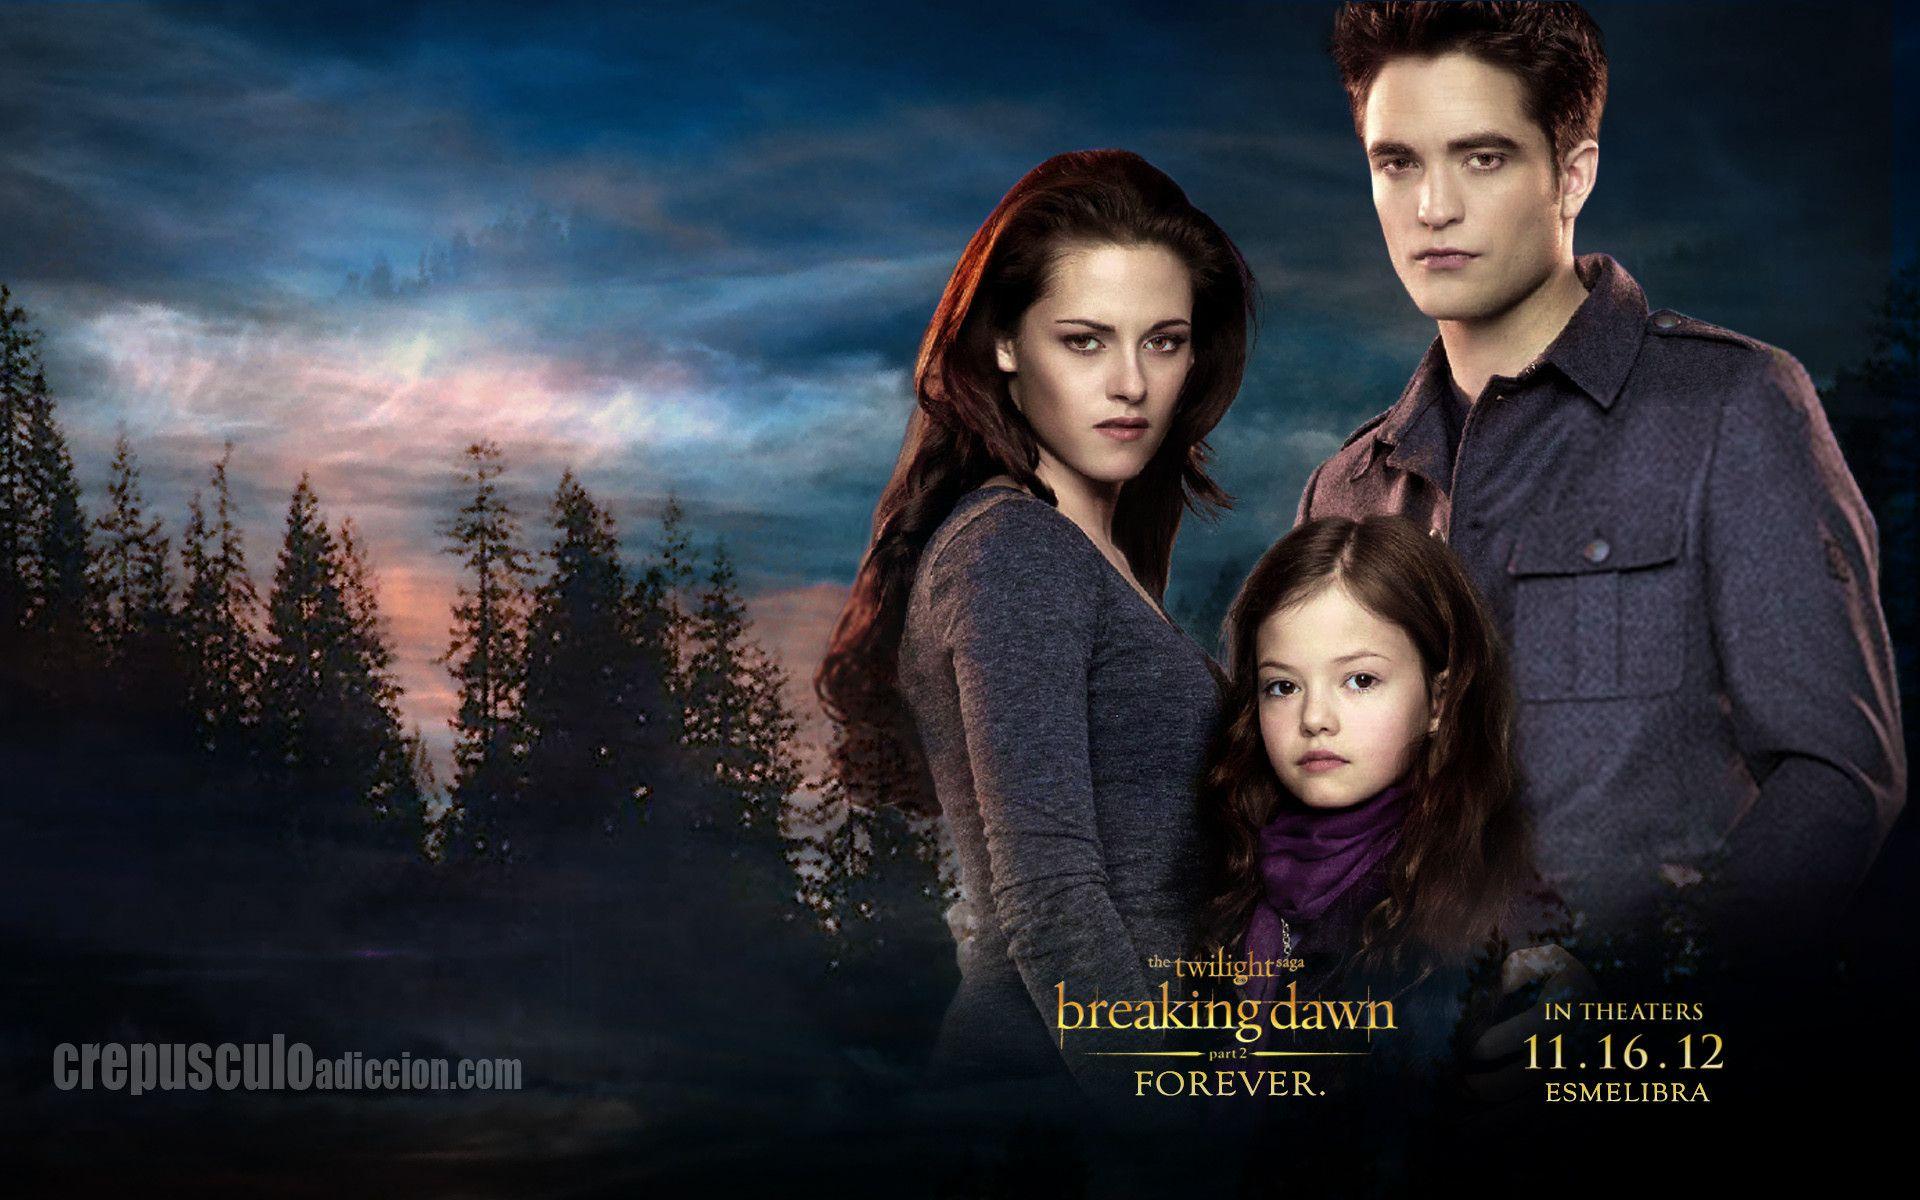 Res 1920x1200 Filme The Twilight Saga Breaking Dawn Part 2 Kristen Stewart Bella Swan Ro Twilight Saga Twilight Saga New Moon The Twilight Saga Eclipse